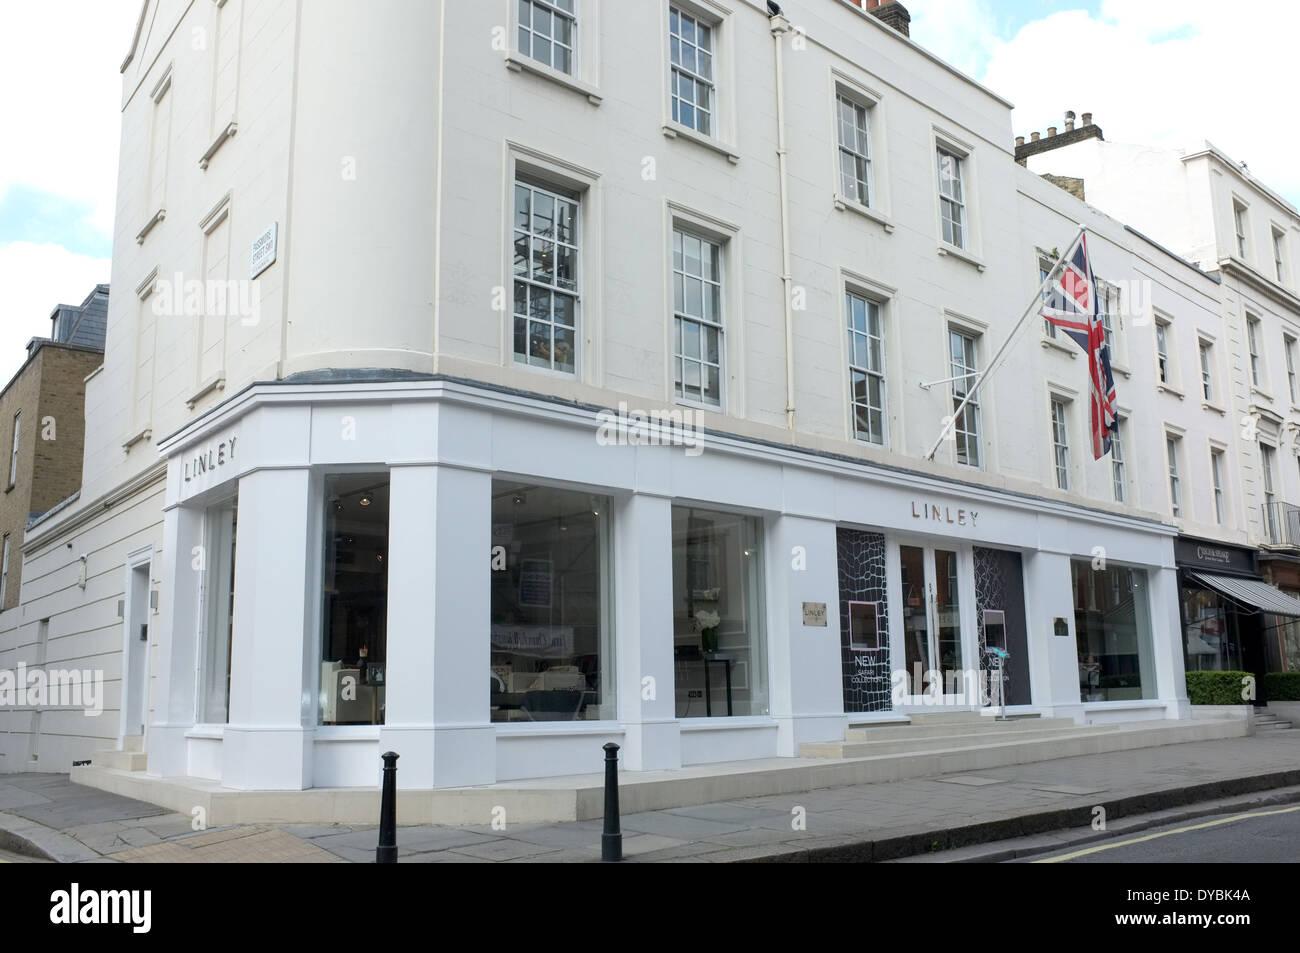 linley furniture shop pimilico road london sw1 uk 2014 - Stock Image